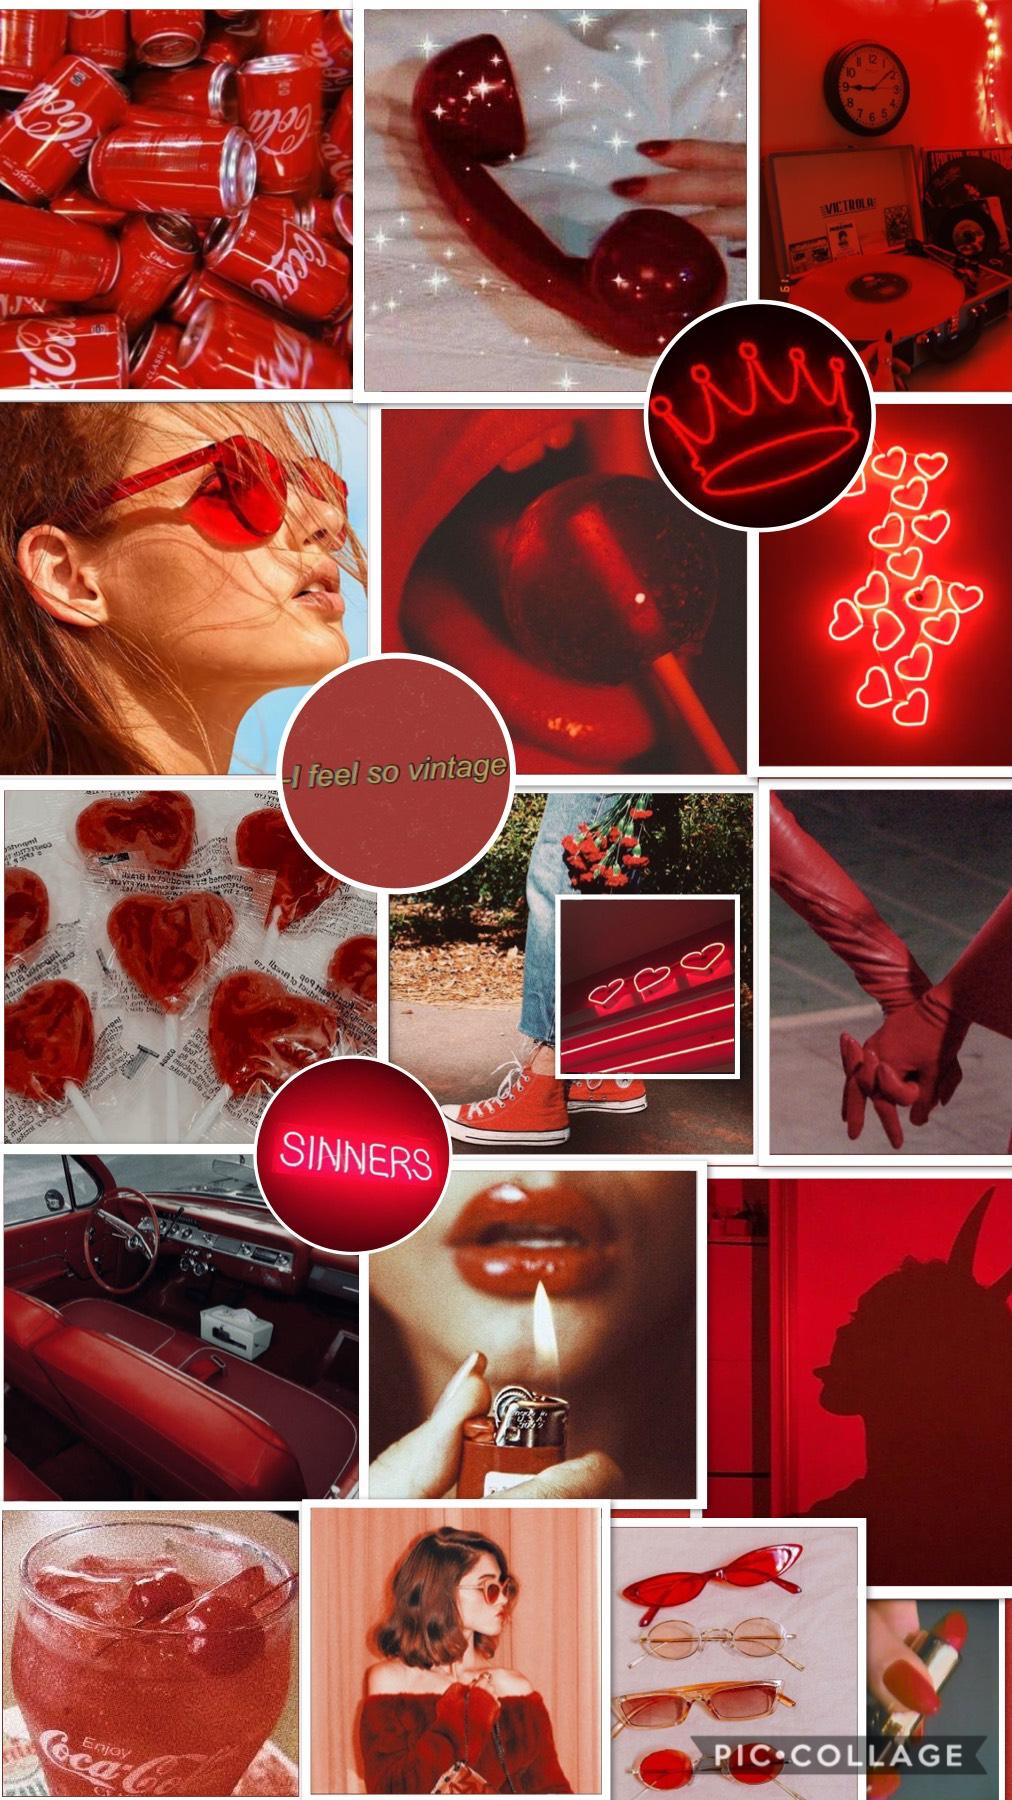 Red aesthetic wallpaper🍒